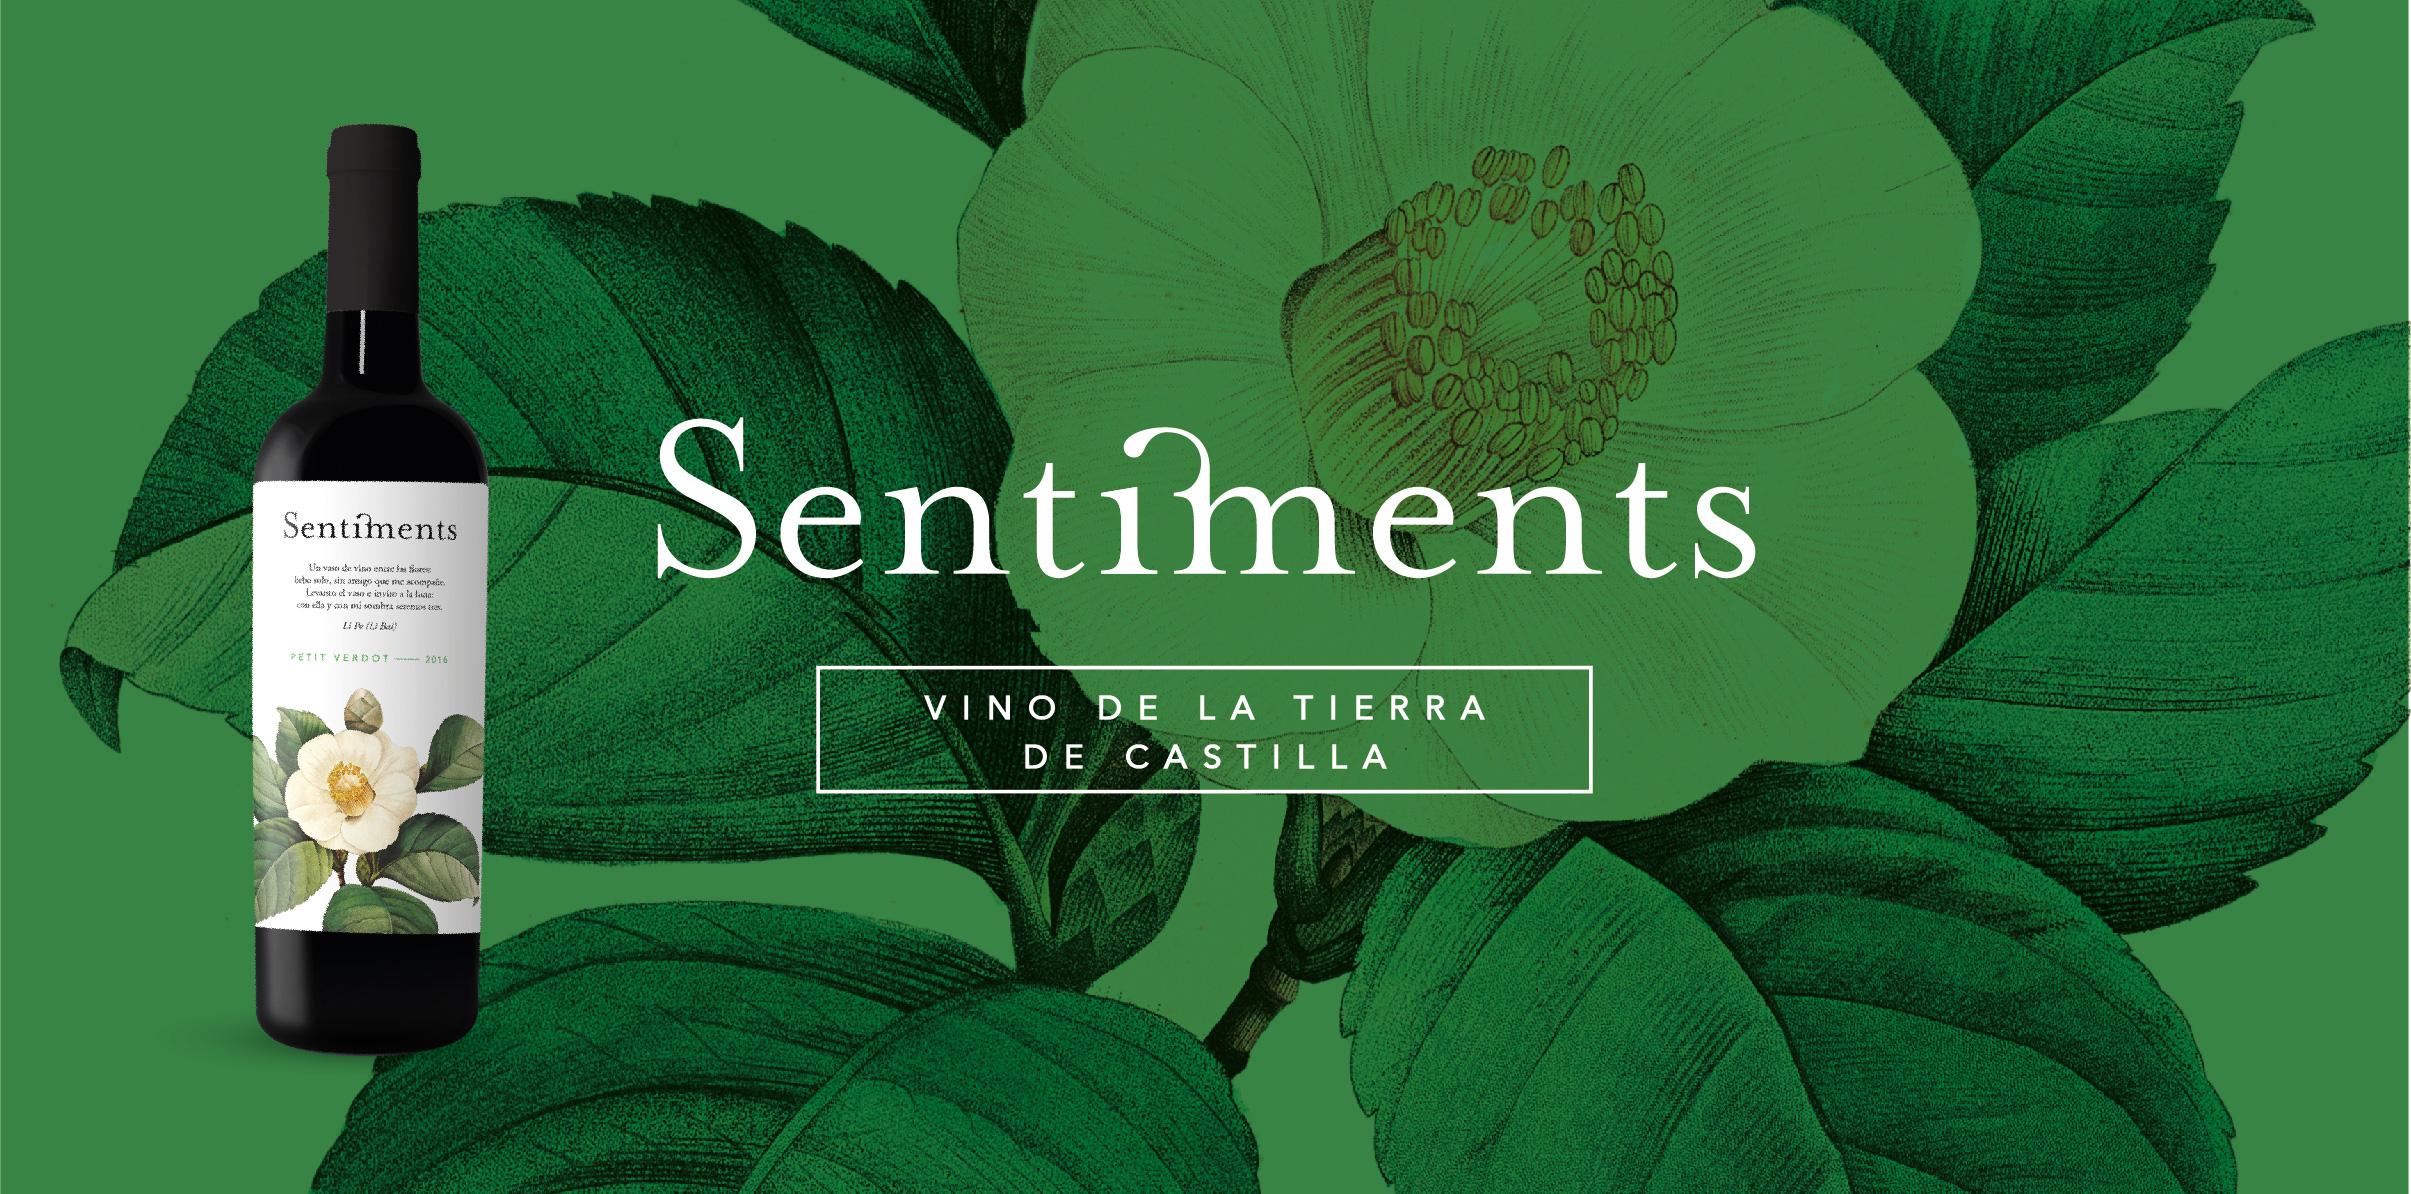 Vino de la tierra de Castilla - Sentiments Petit Verdot 2016 - Minaya (albacete) - Bodegas Bonjorne